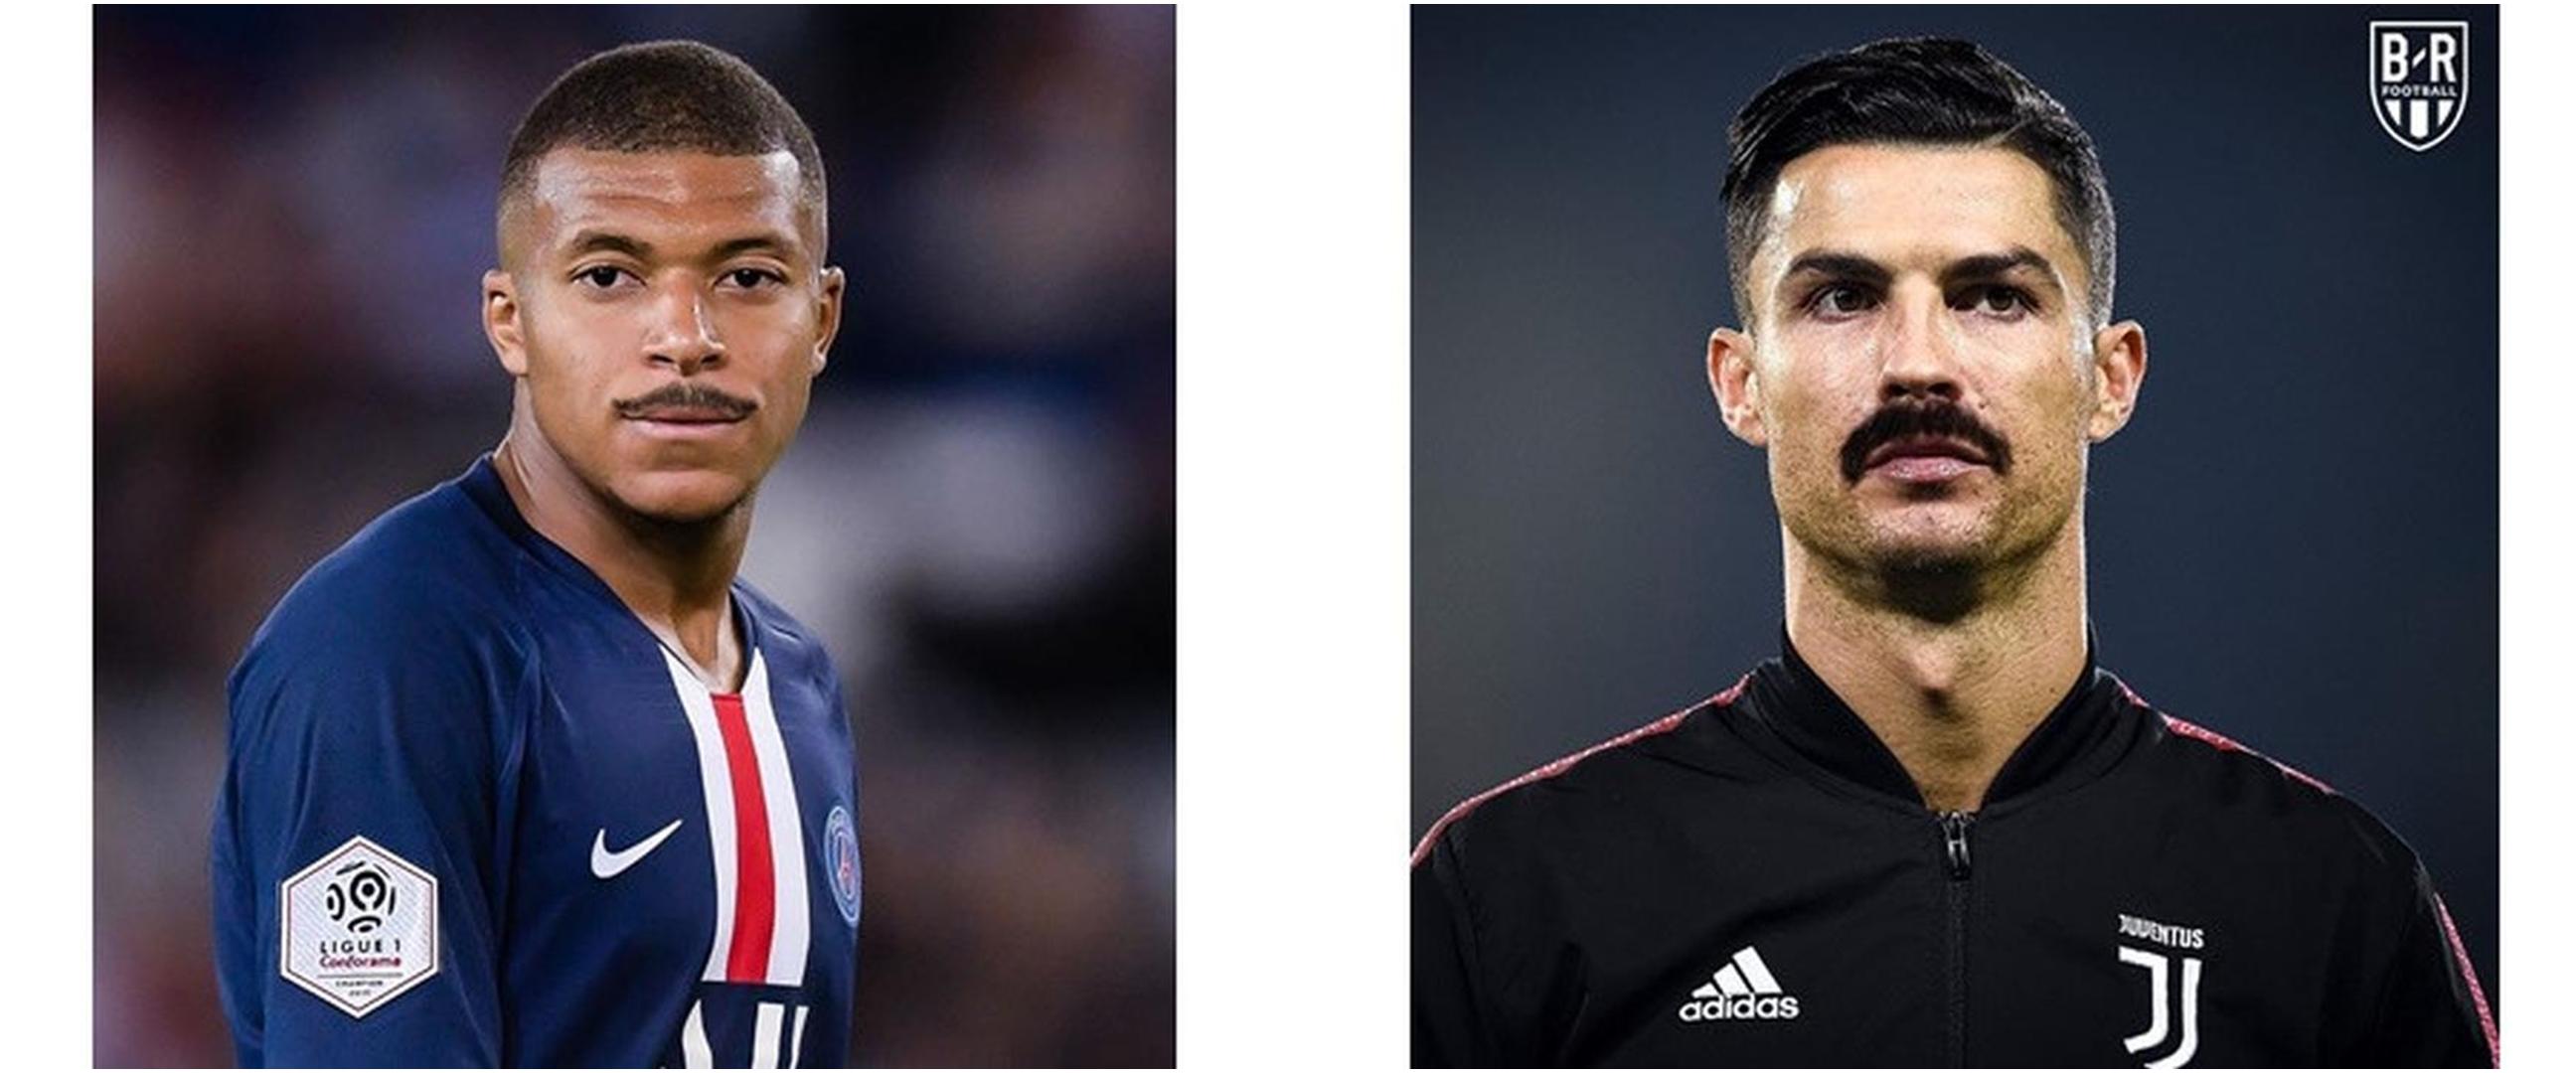 6 Editan foto pemain bola top Eropa berkumis, makin macho